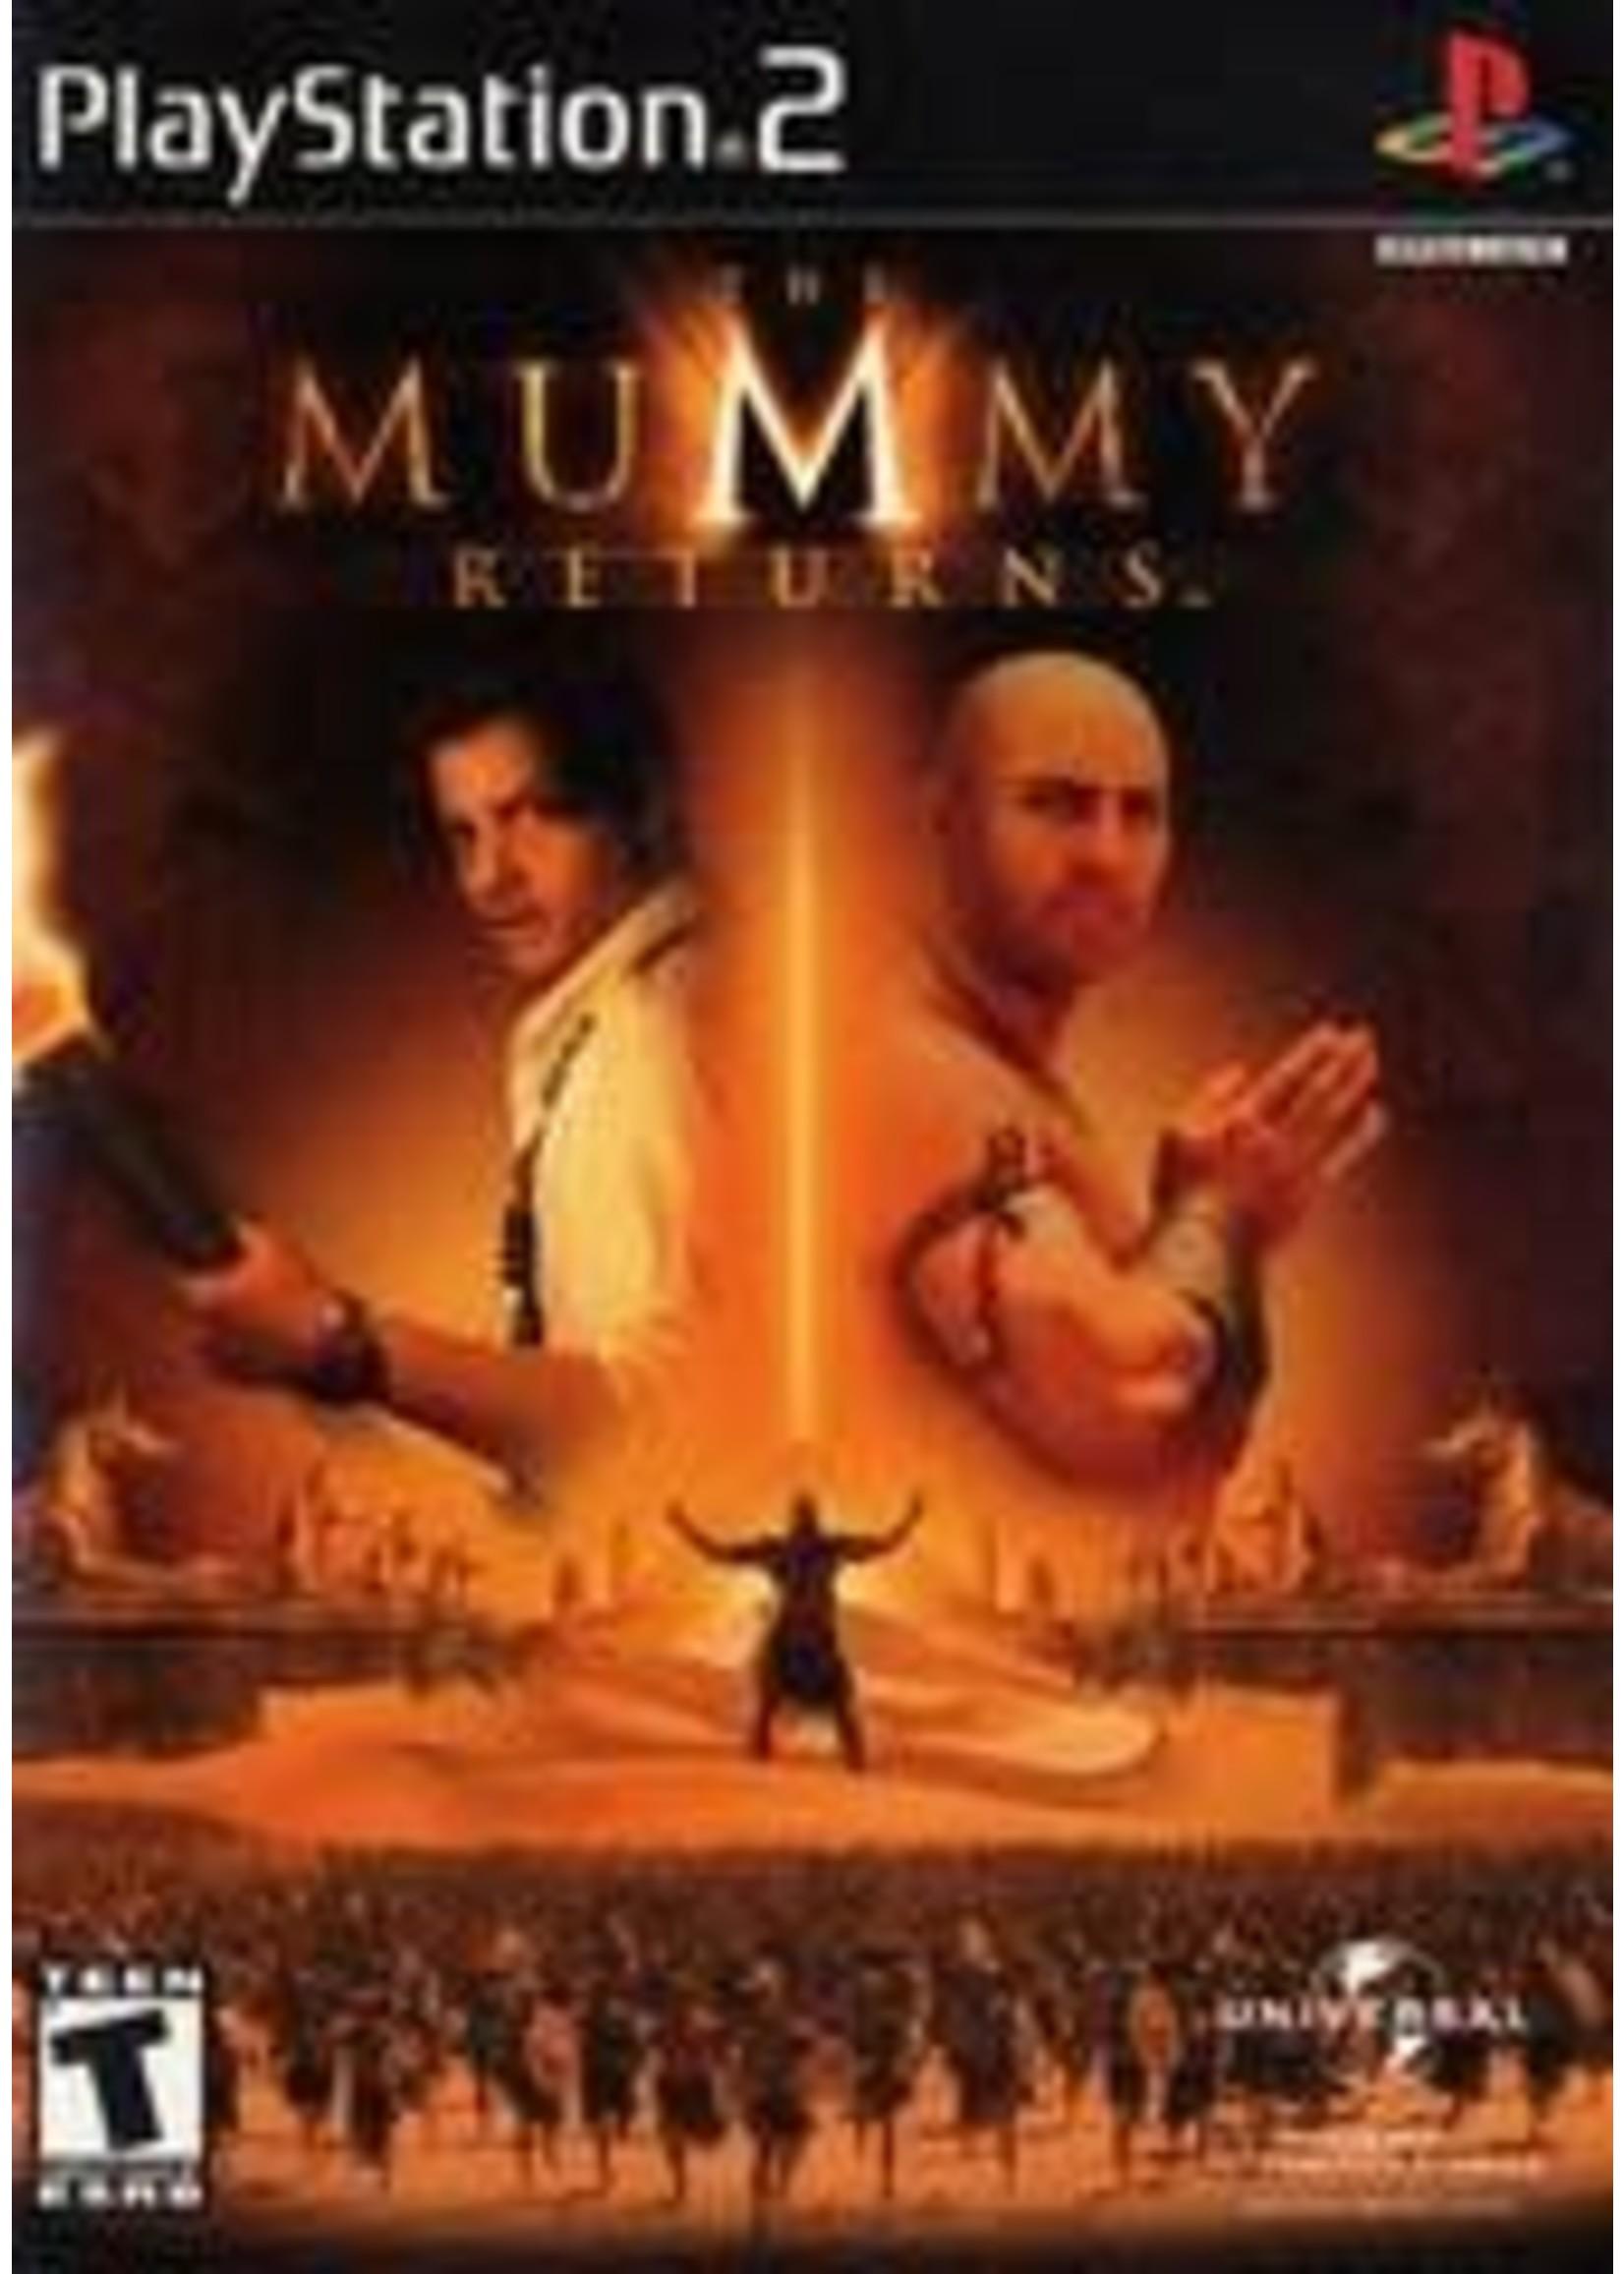 The Mummy Returns Playstation 2